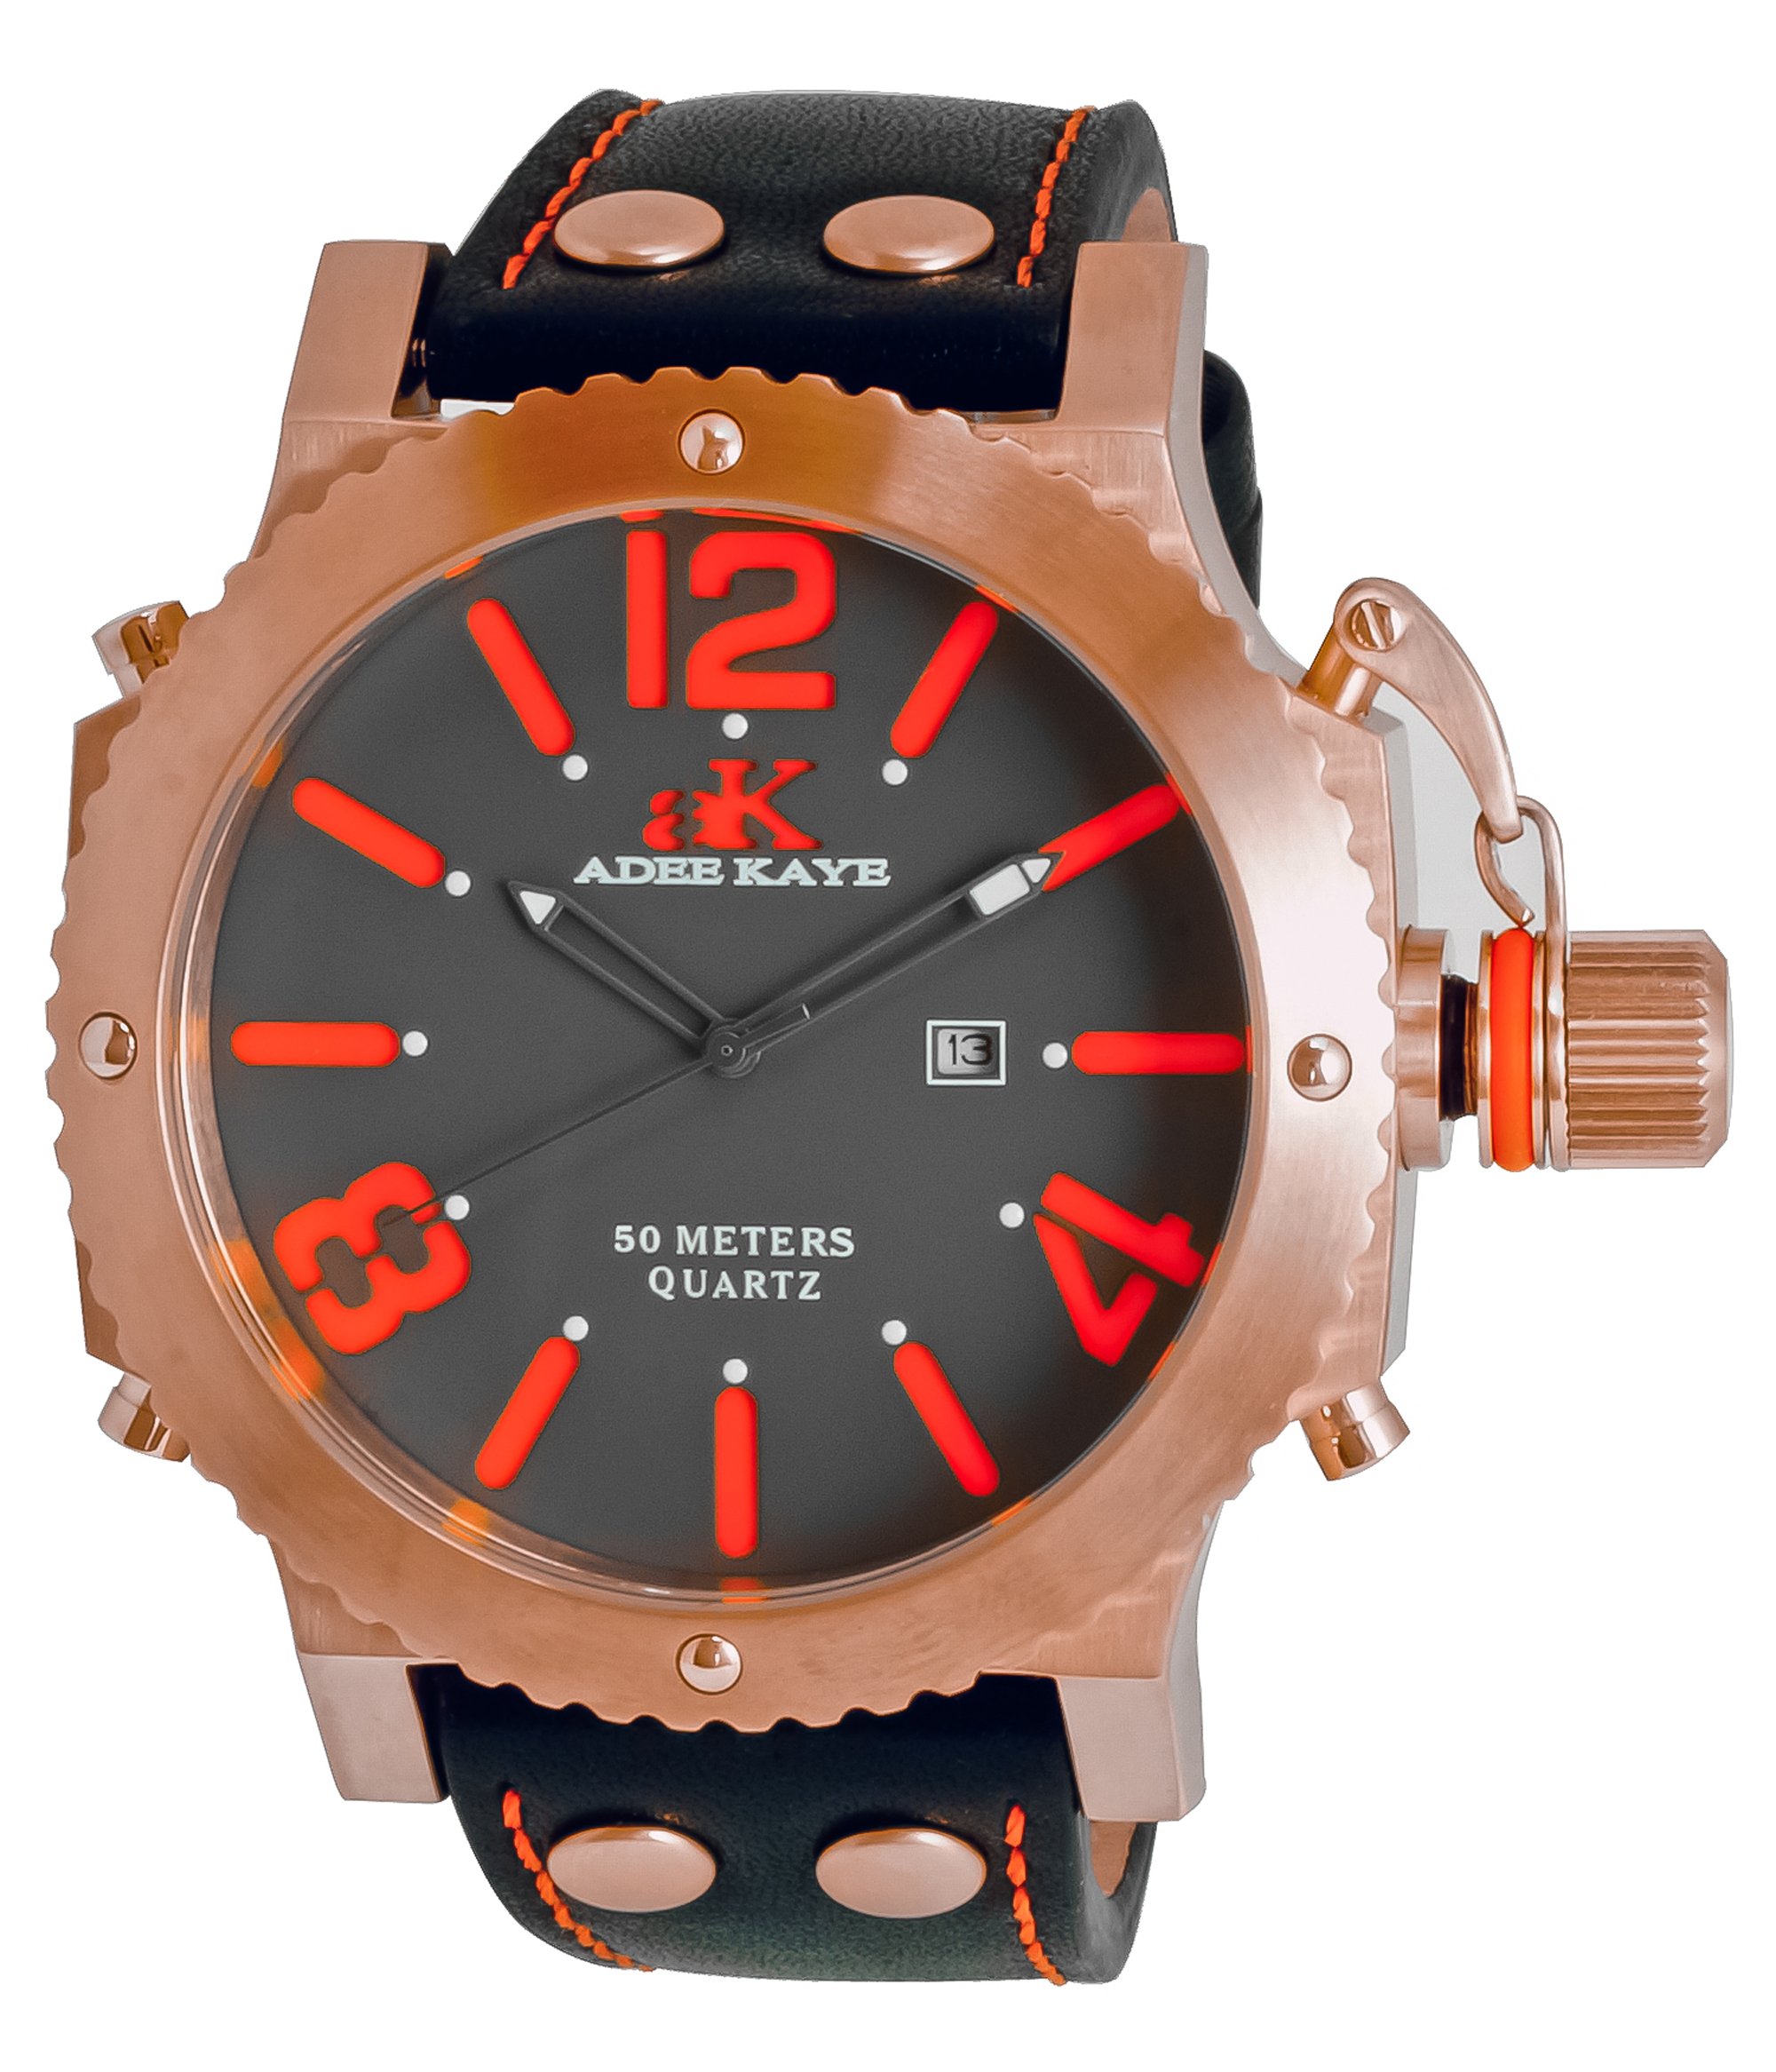 ADEEKAYE AK7211-MRG Mens Mondo G2 Quartz Watch-Gray orange at Sears.com